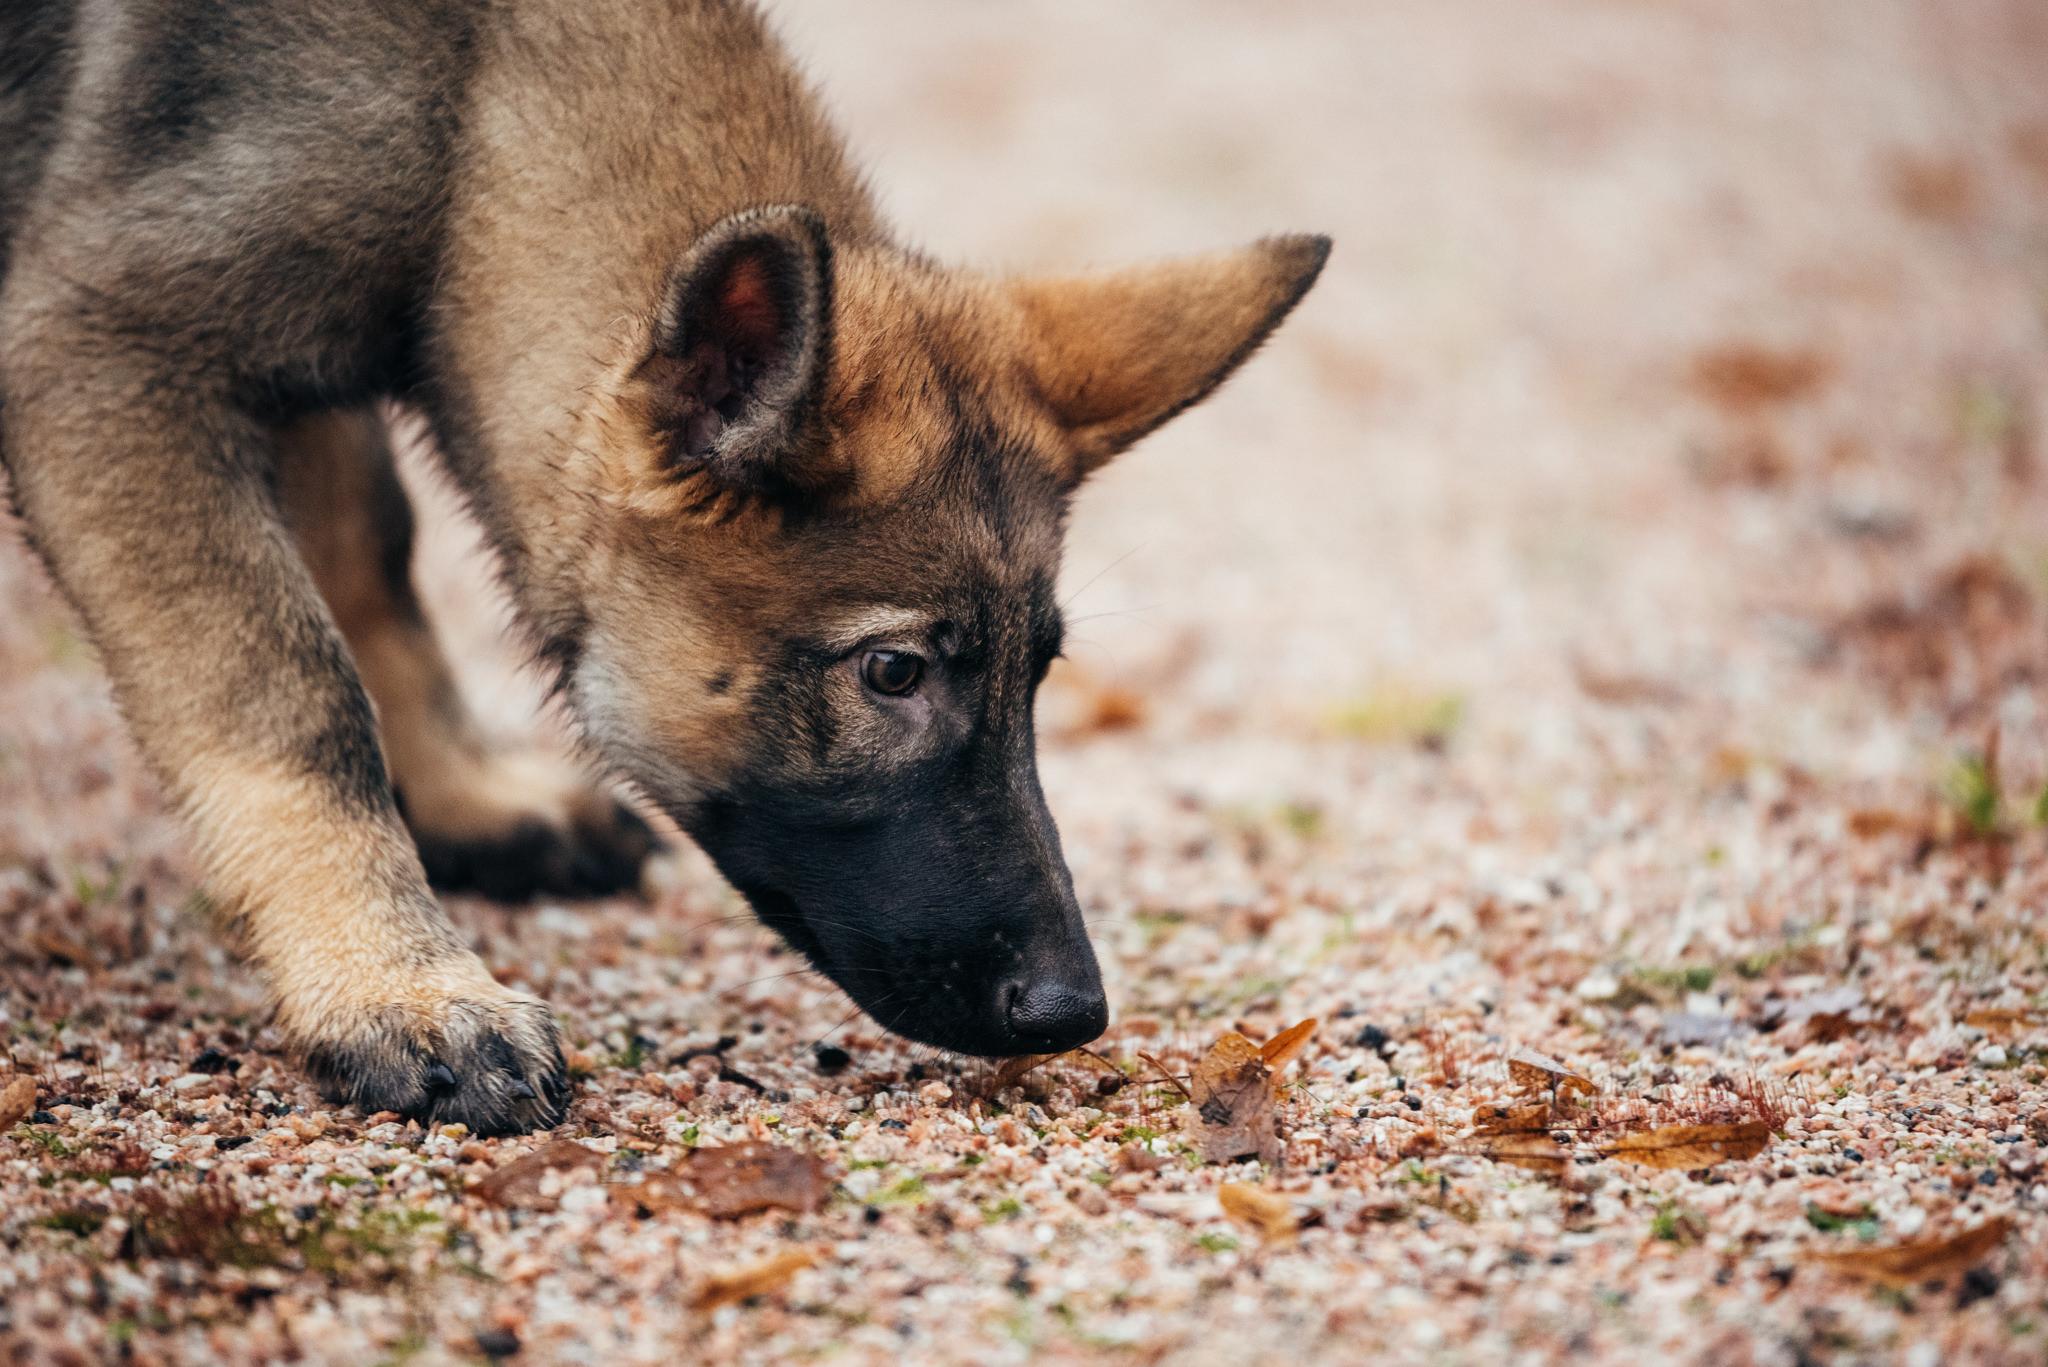 Nosen är ett av hundens viktigaste verktyg